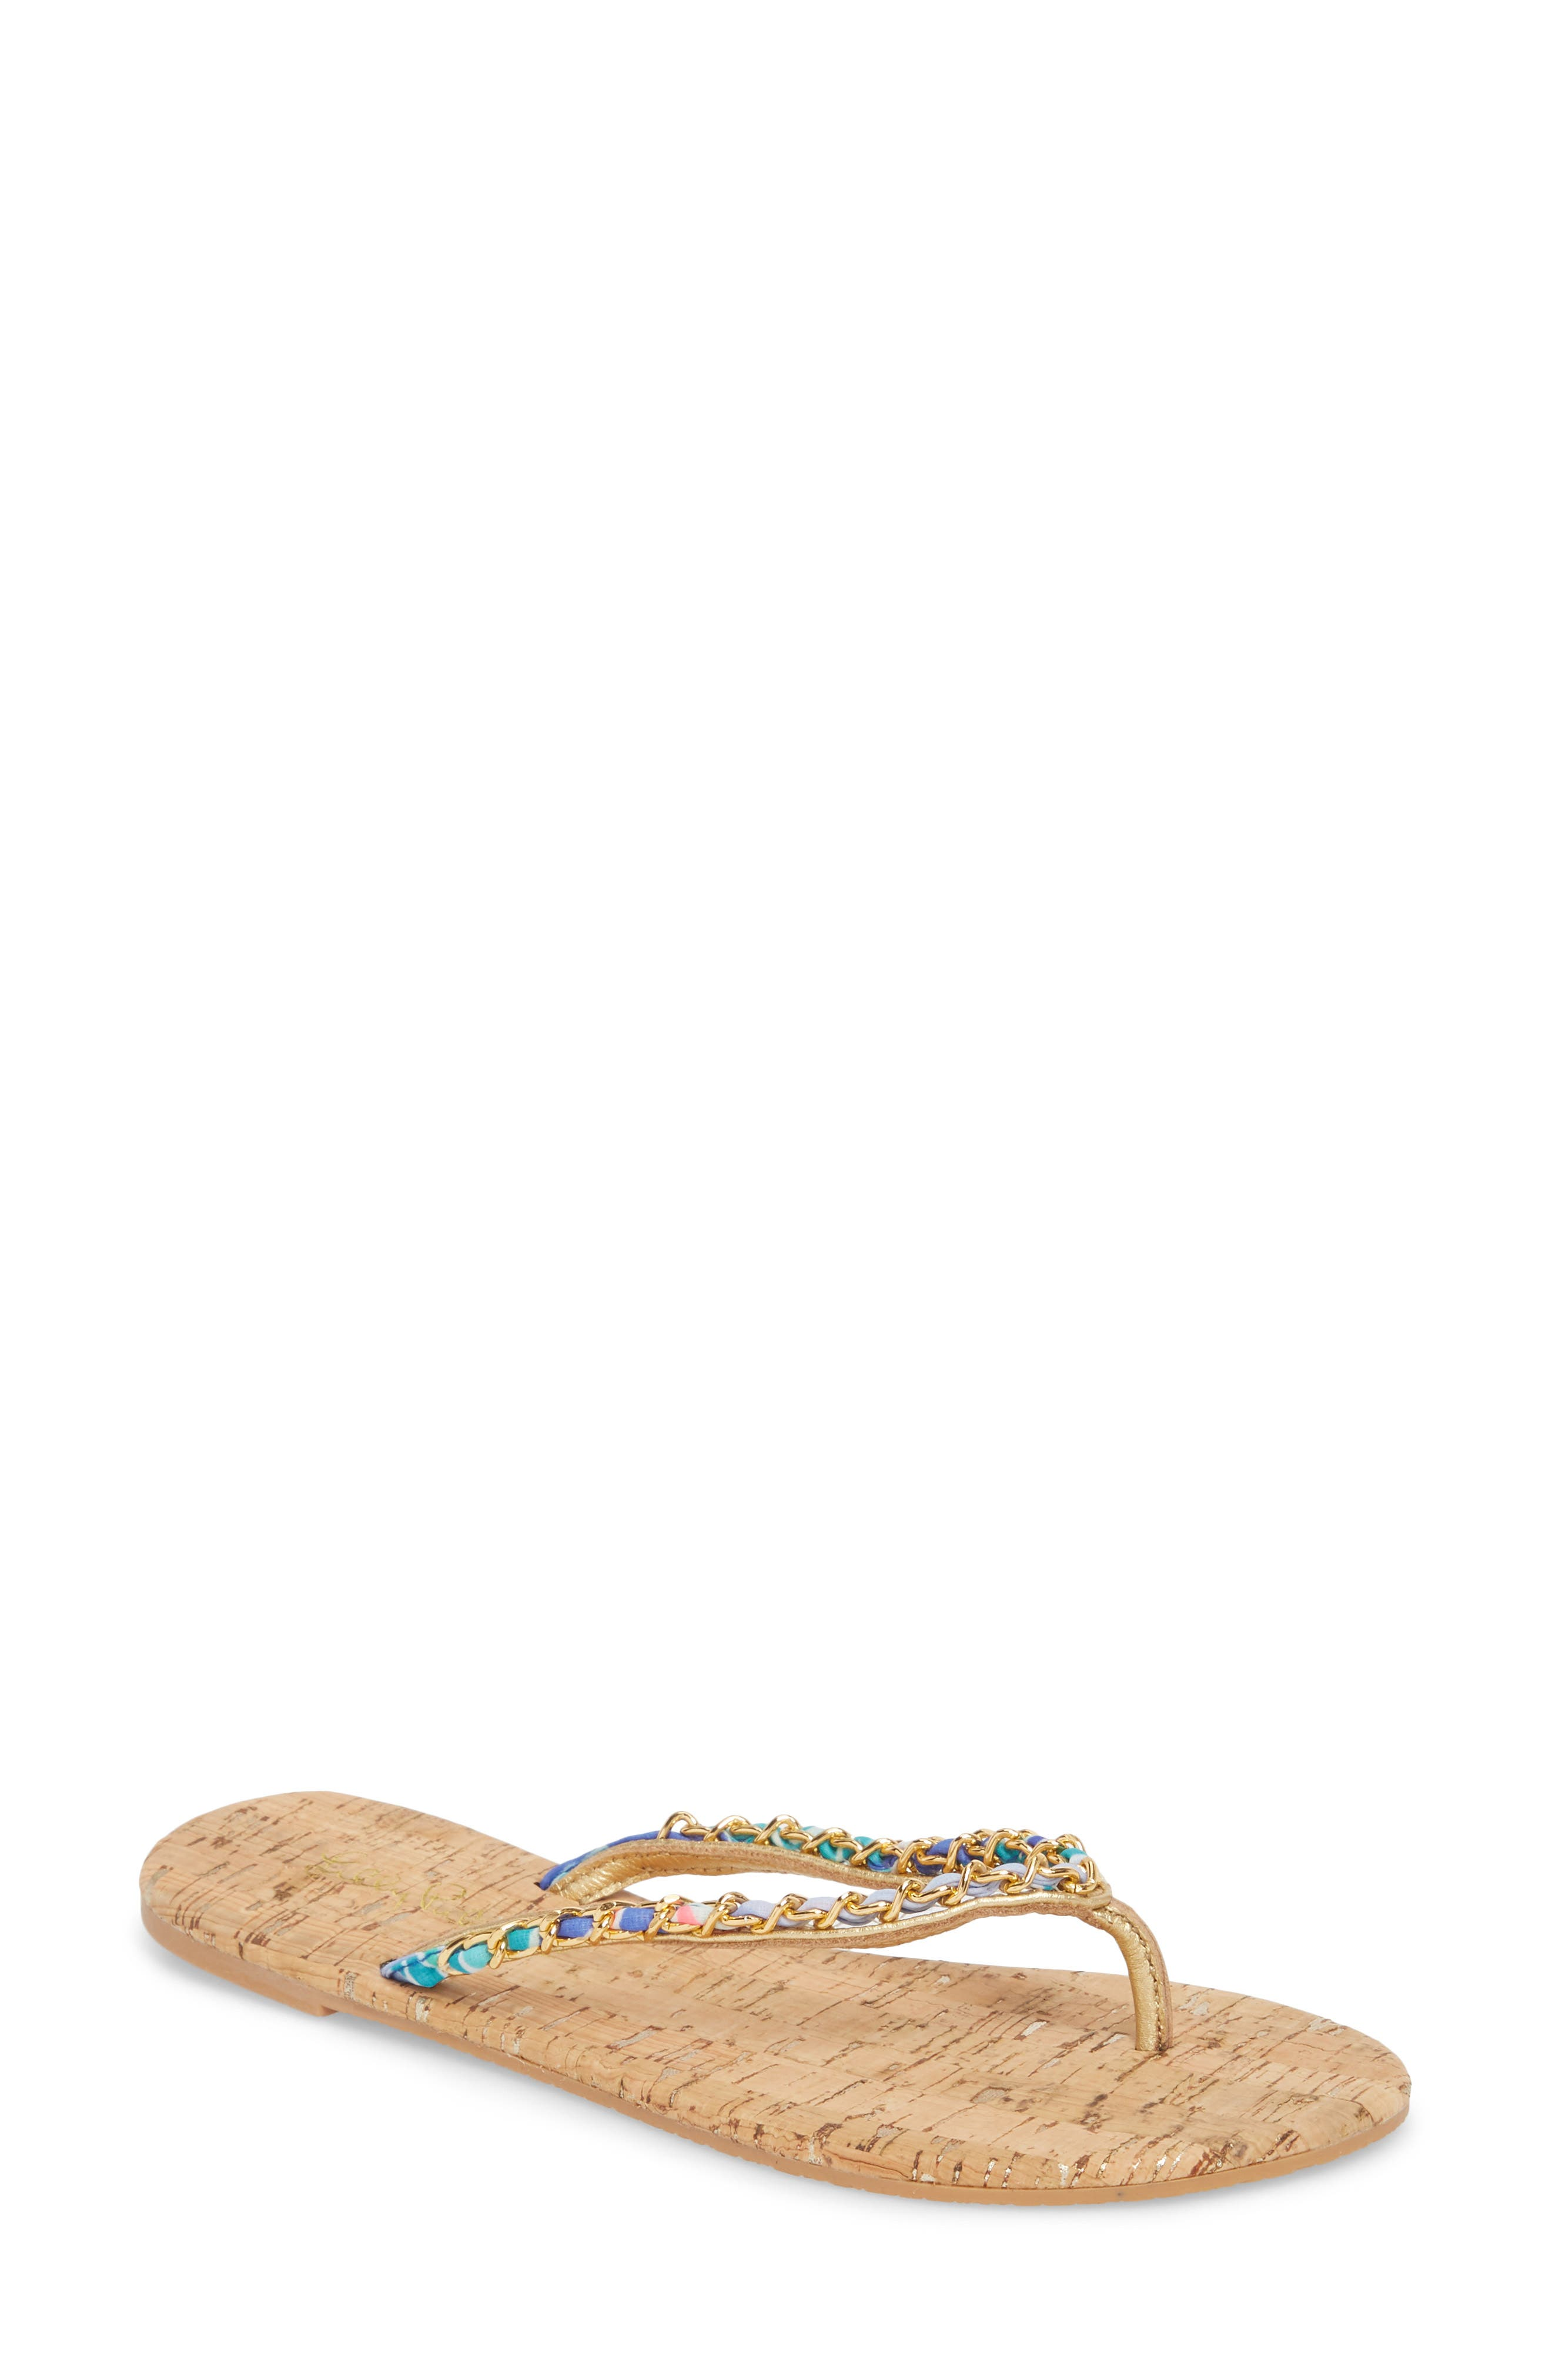 Lily Pulitzer<sup>®</sup> Naples Chain Trimmed Flip Flop,                         Main,                         color, NATURAL